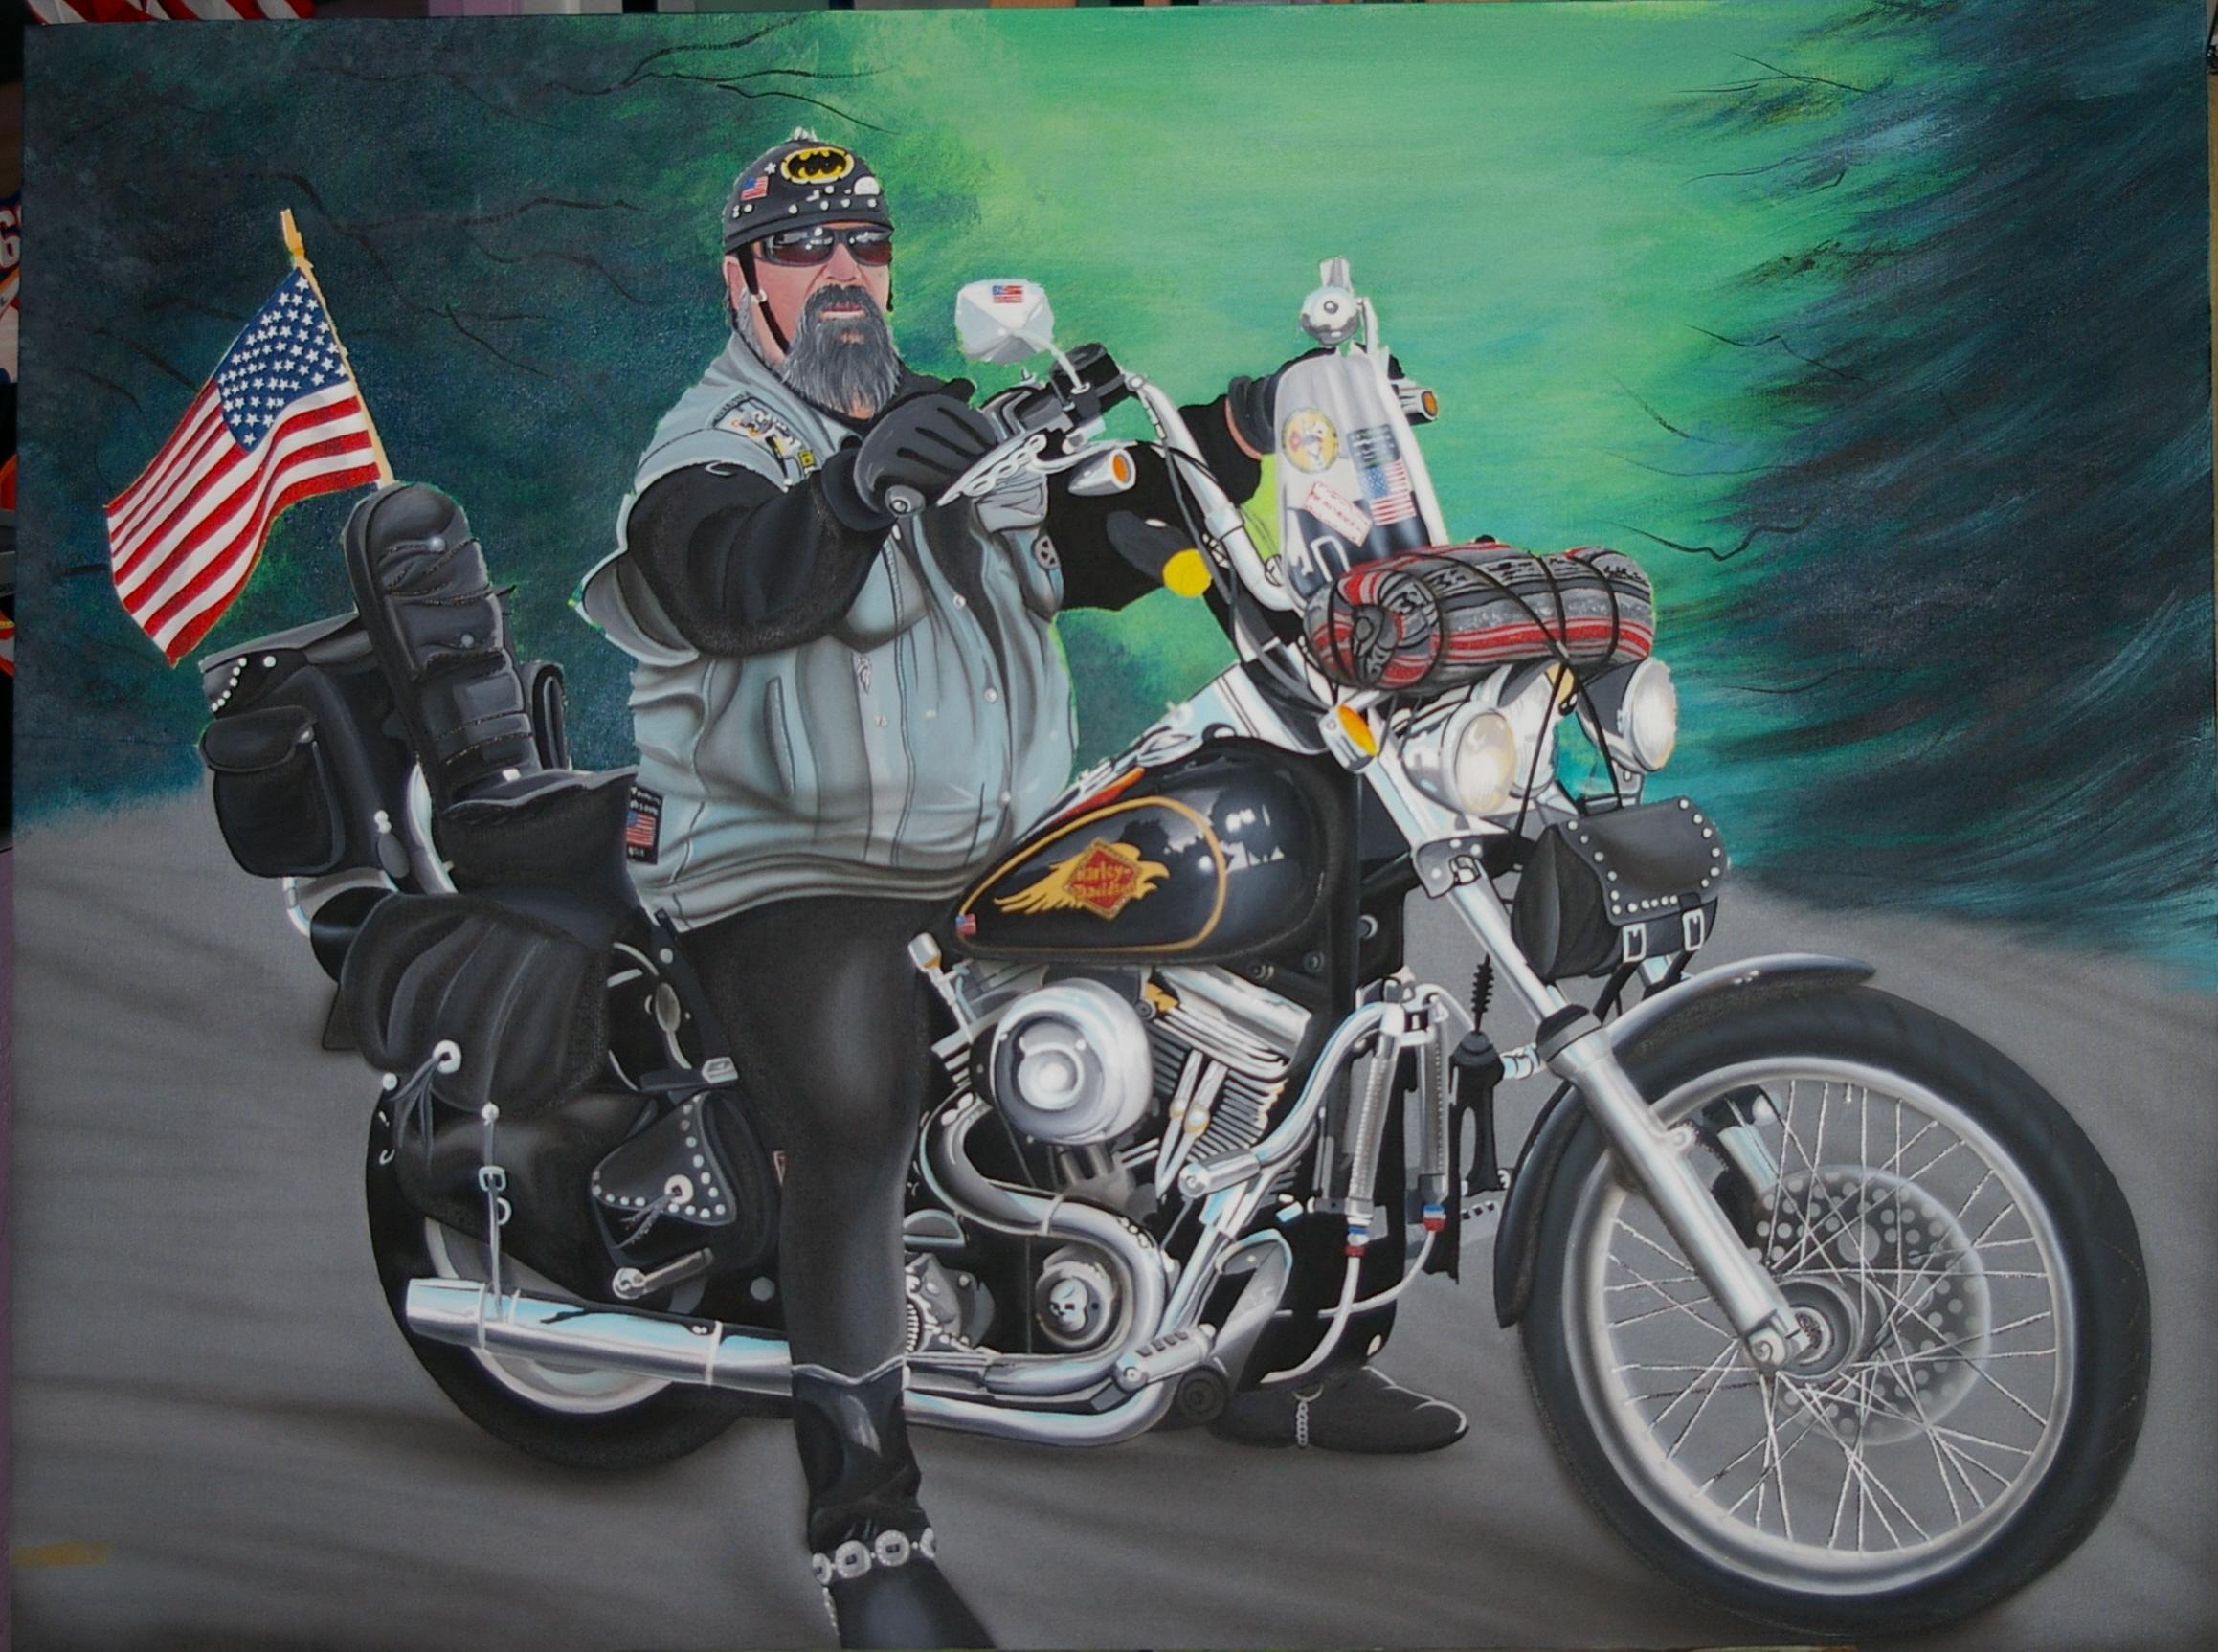 David Mann Motorcycle Art Wallpaper 2317x1726